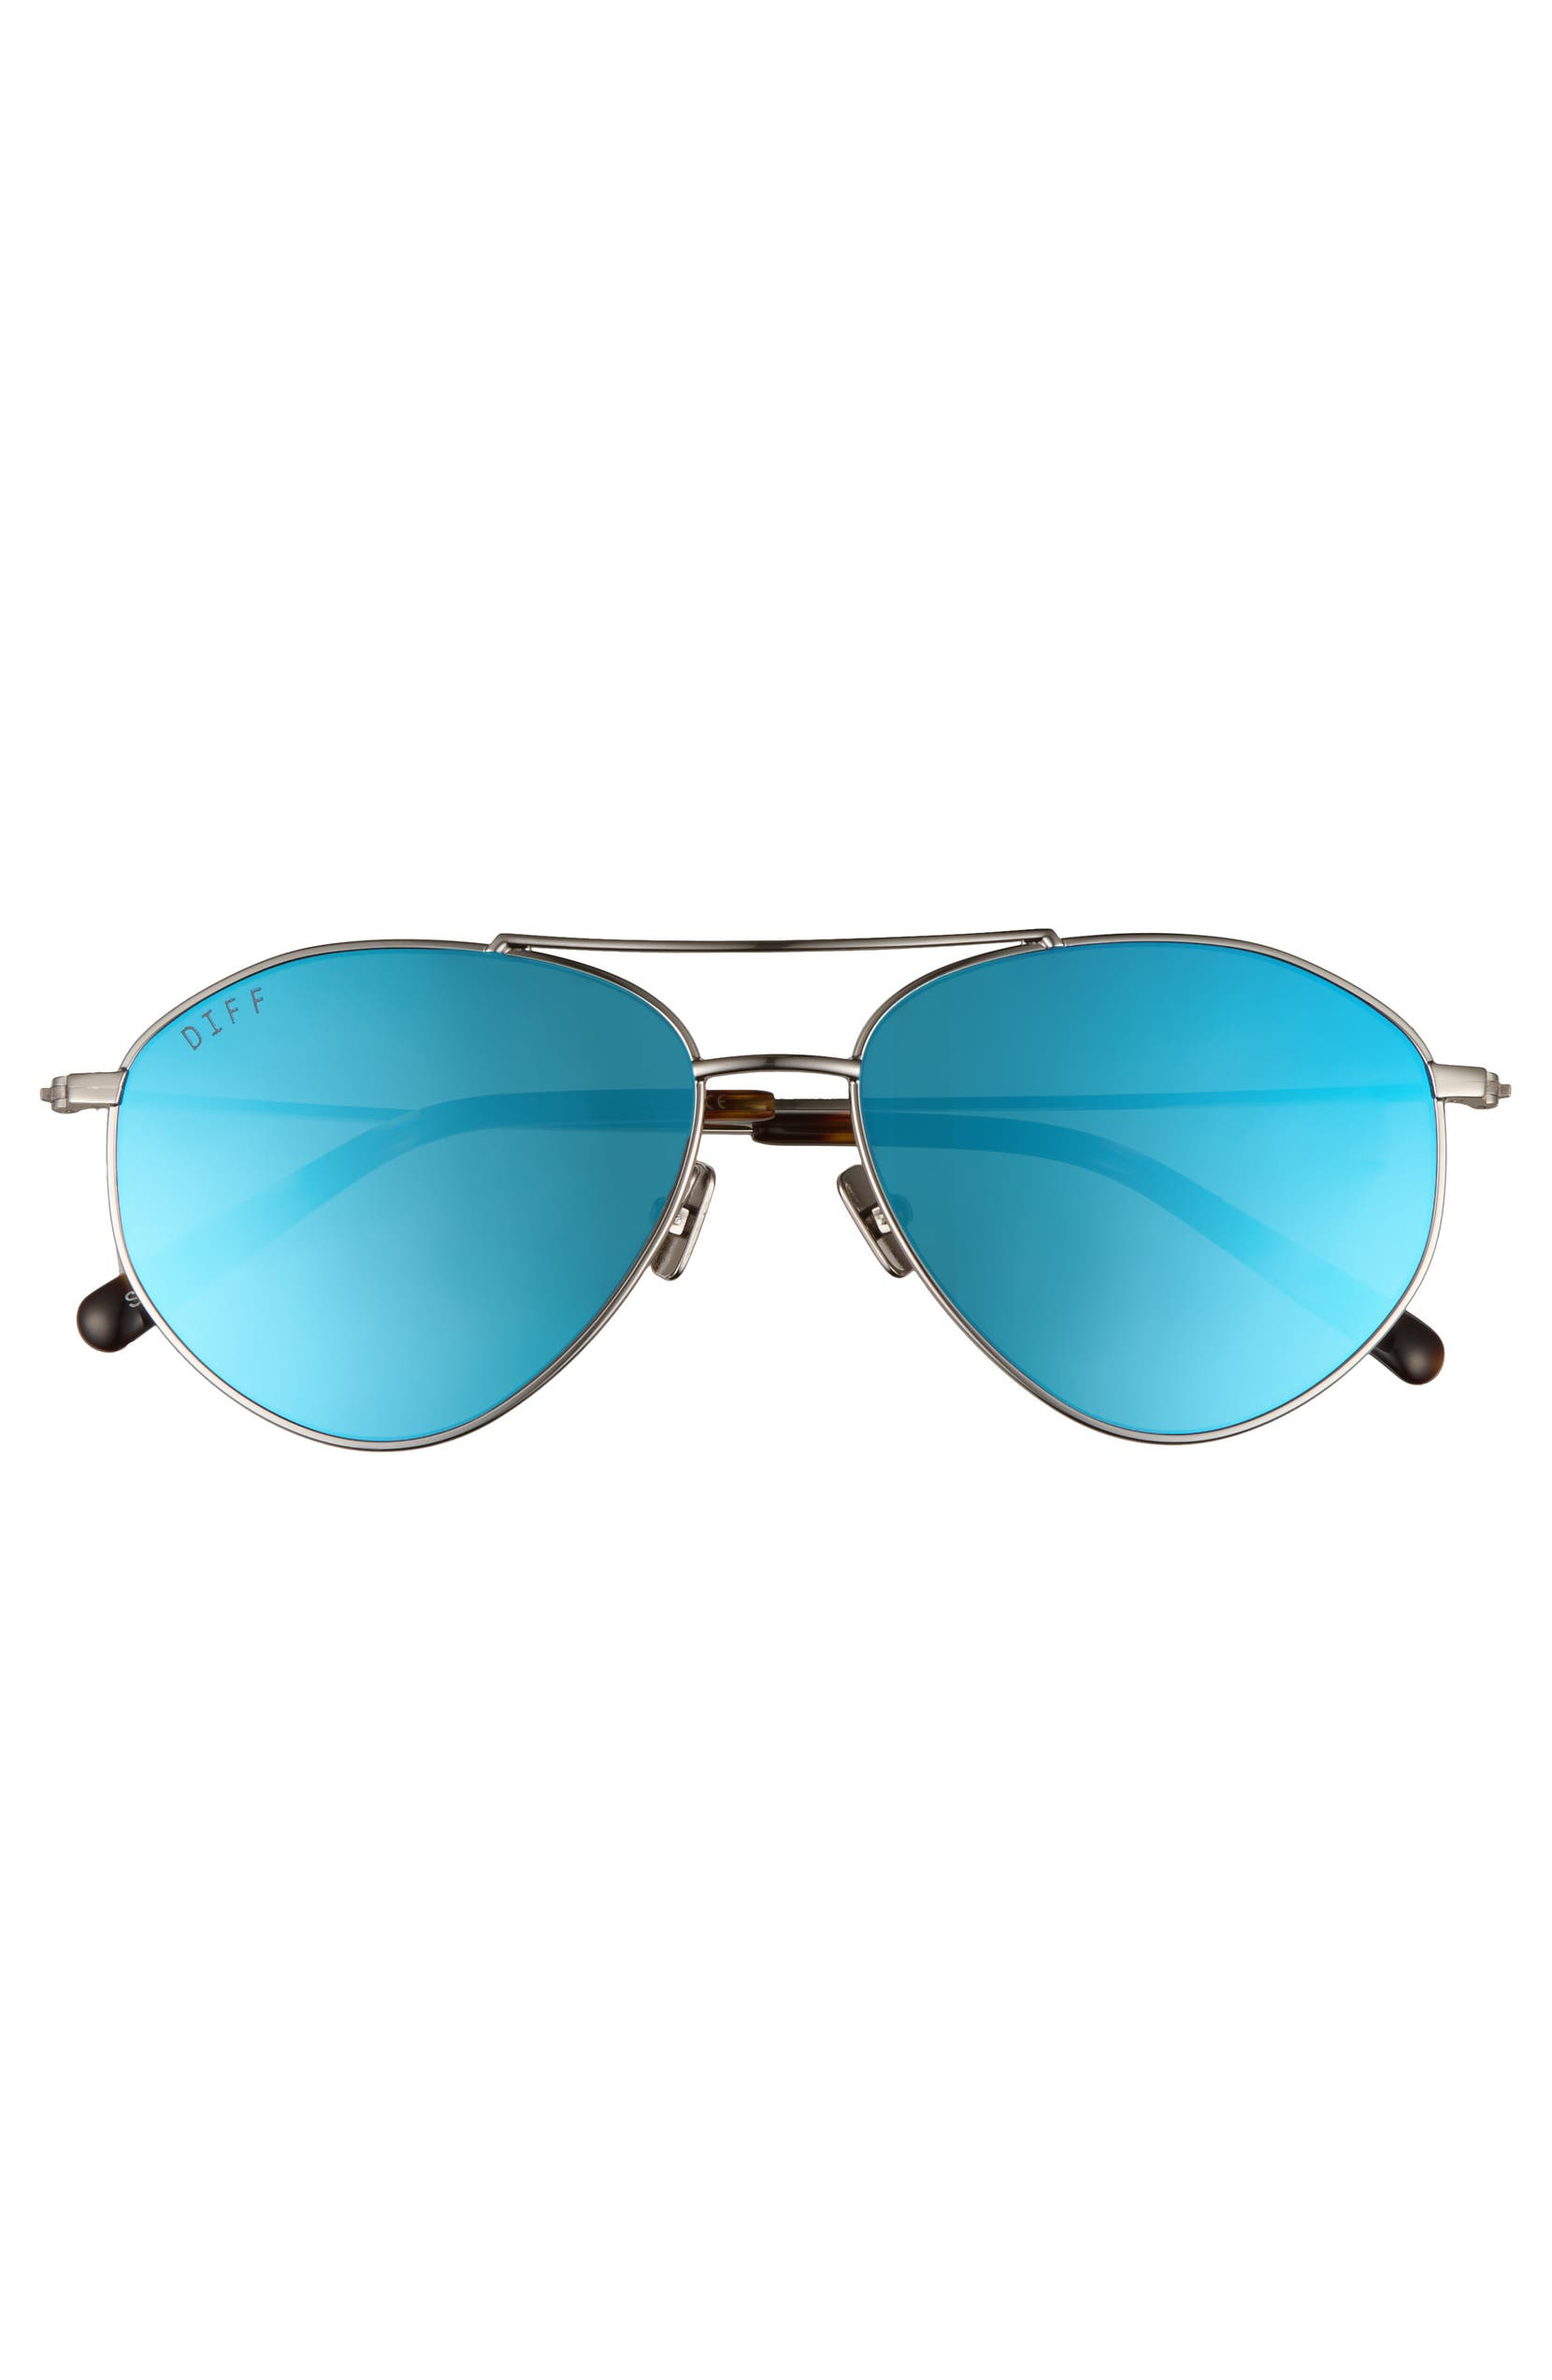 ed8b7c56feb09 DIFF Scout 53mm Aviator Sunglasses